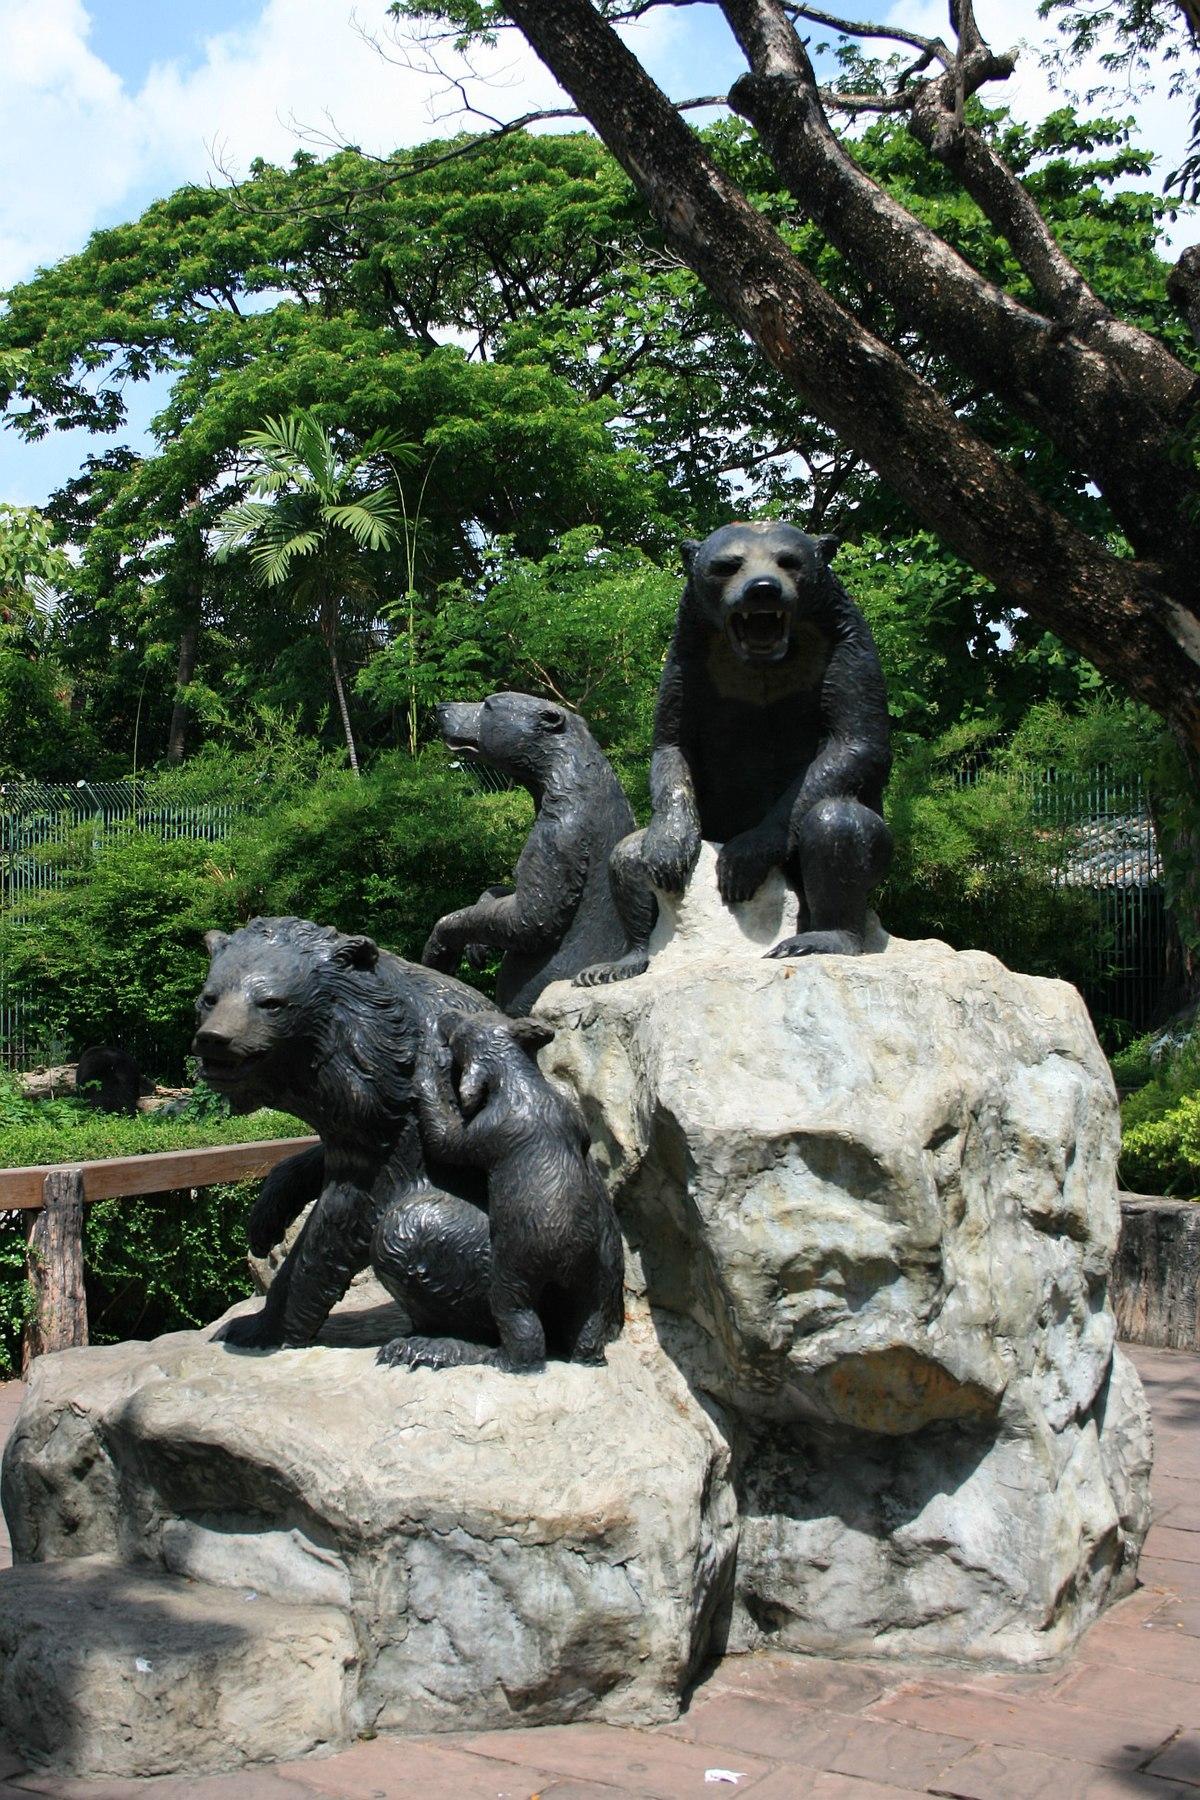 Dusit Zoo - Wikipedia